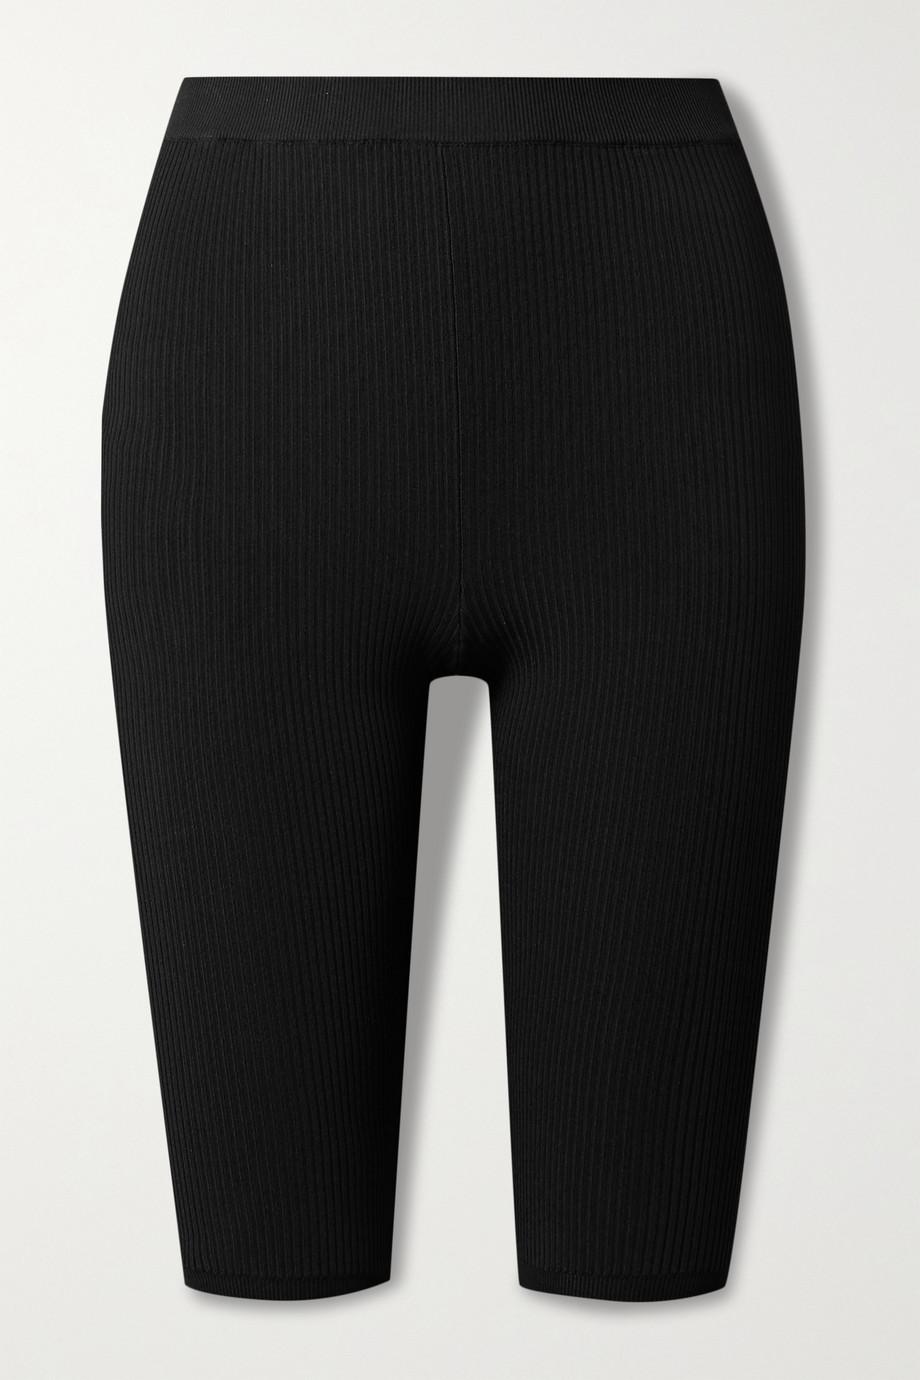 SAINT LAURENT Shorts aus geripptem Stretch-Strick